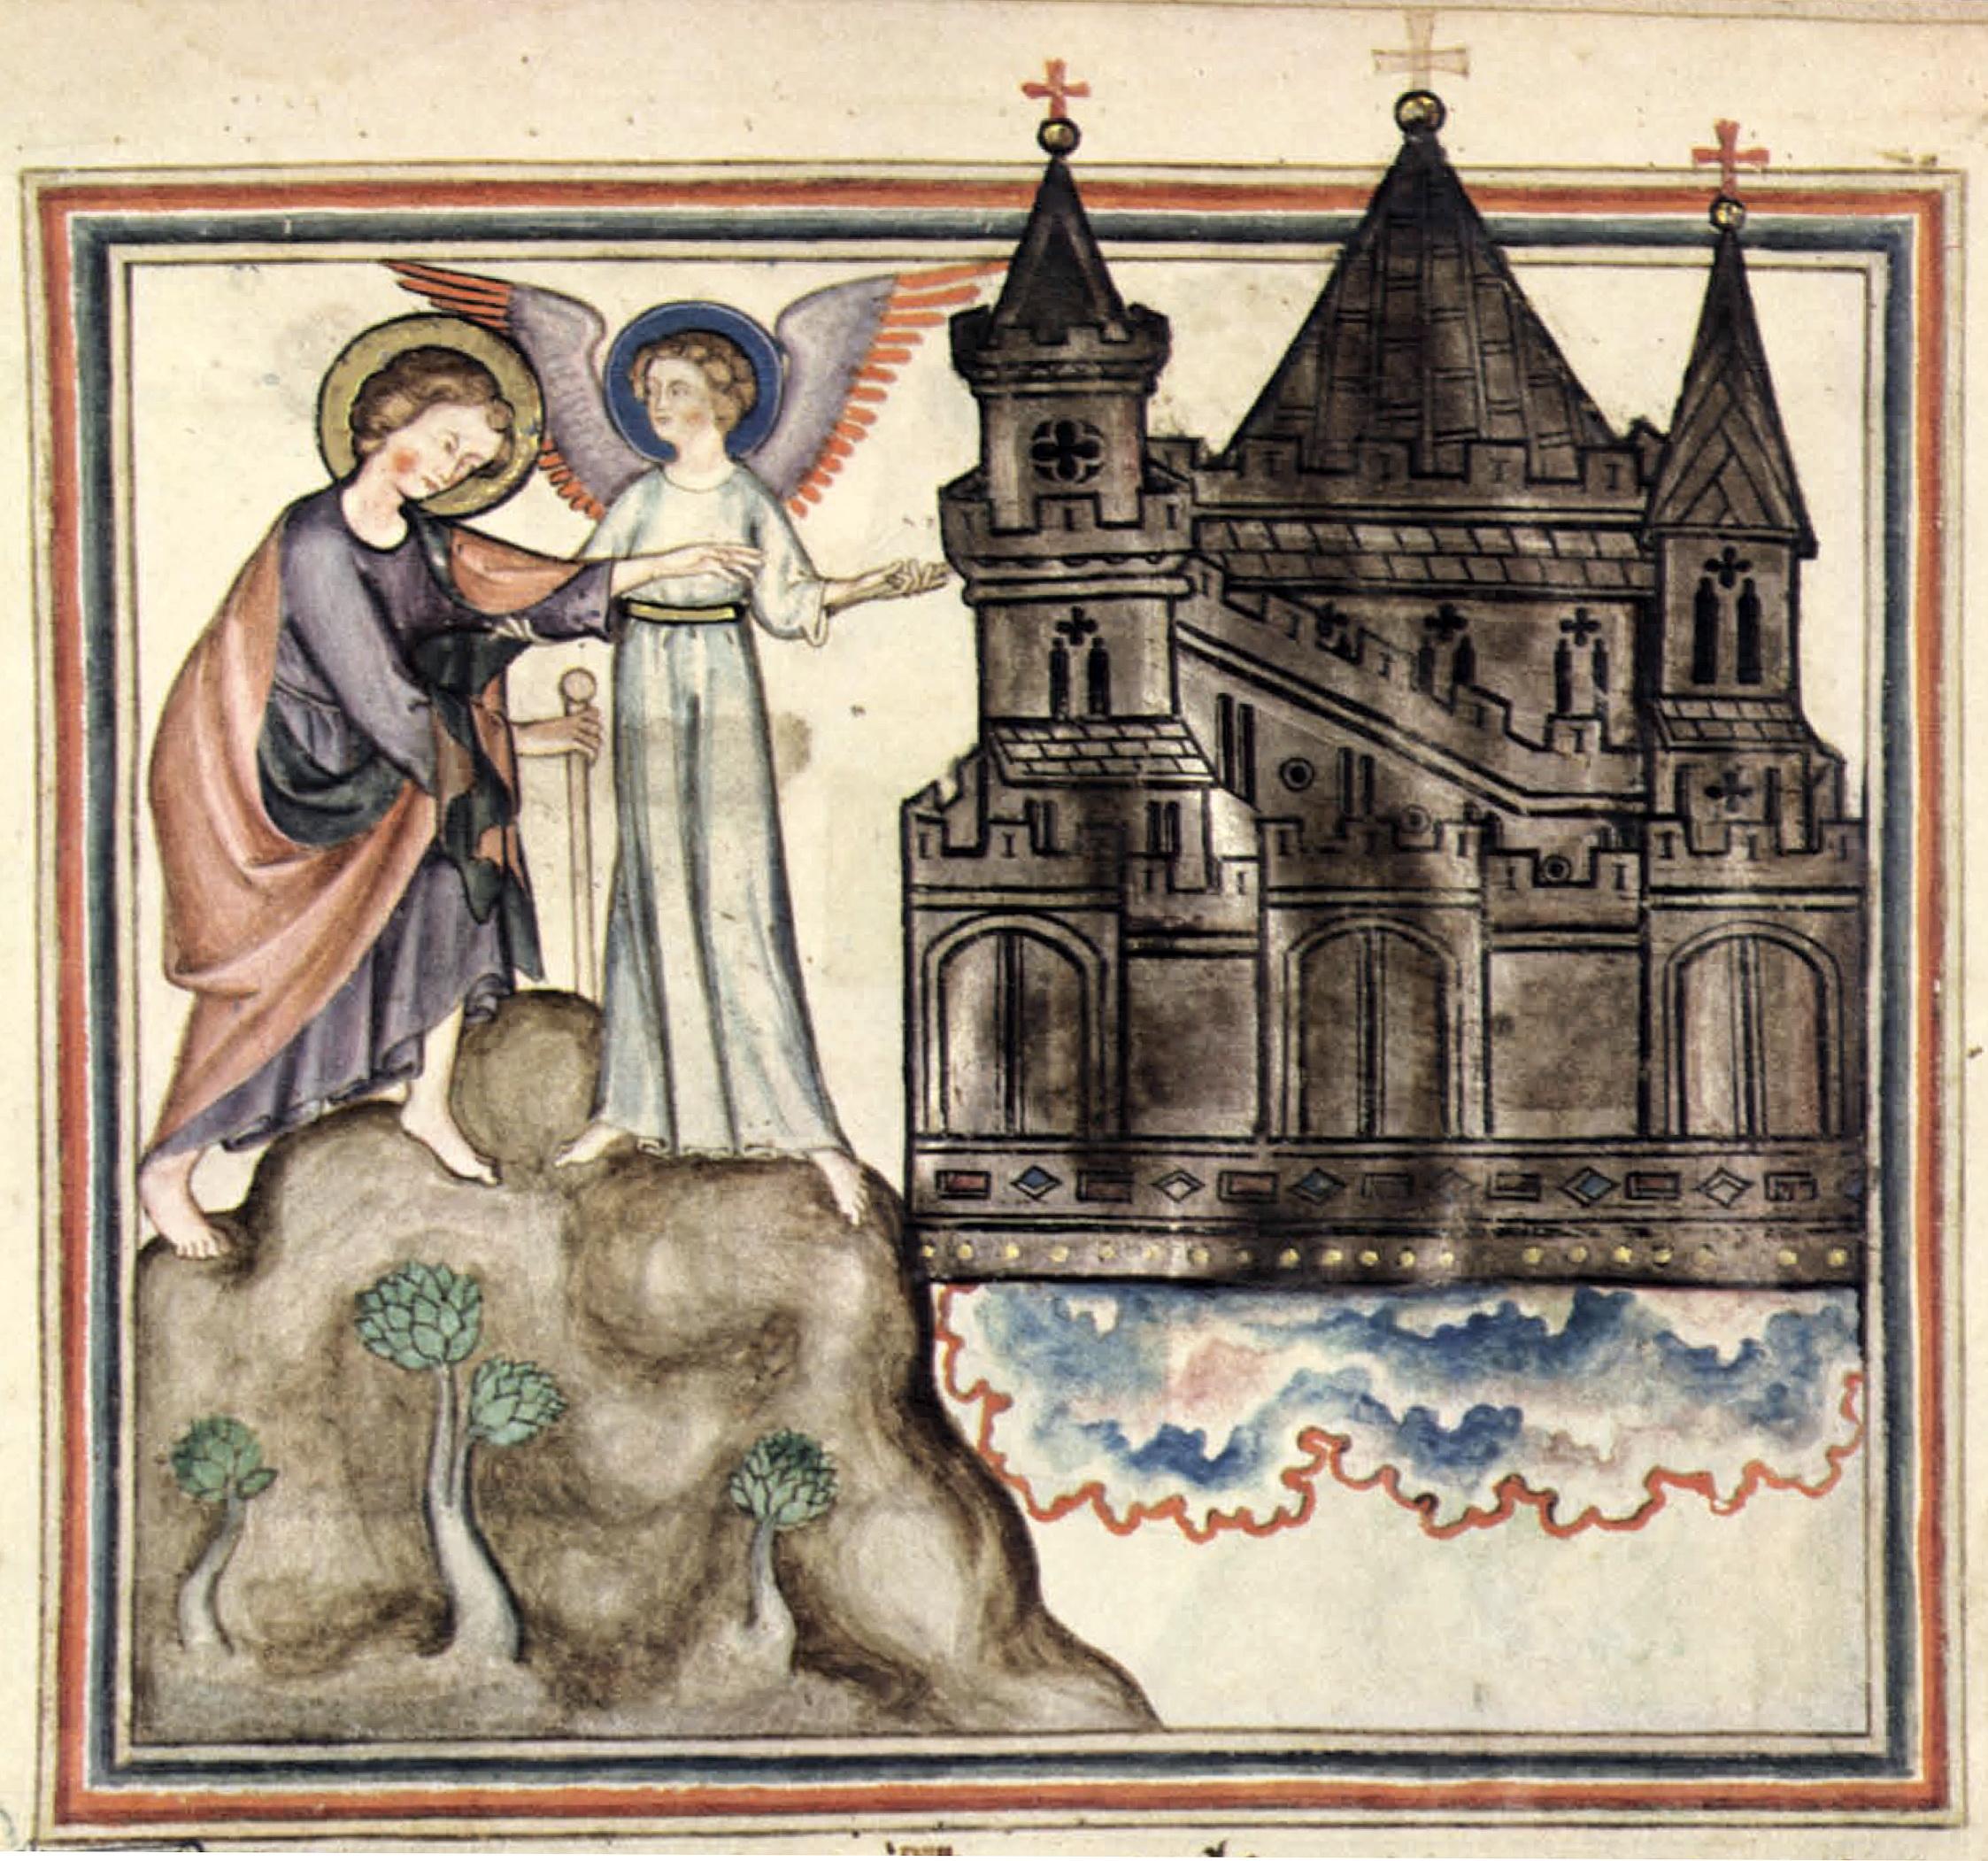 File:Cloisters Apocalypse - New Jerusalem and angel.jpg - Wikimedia Commons